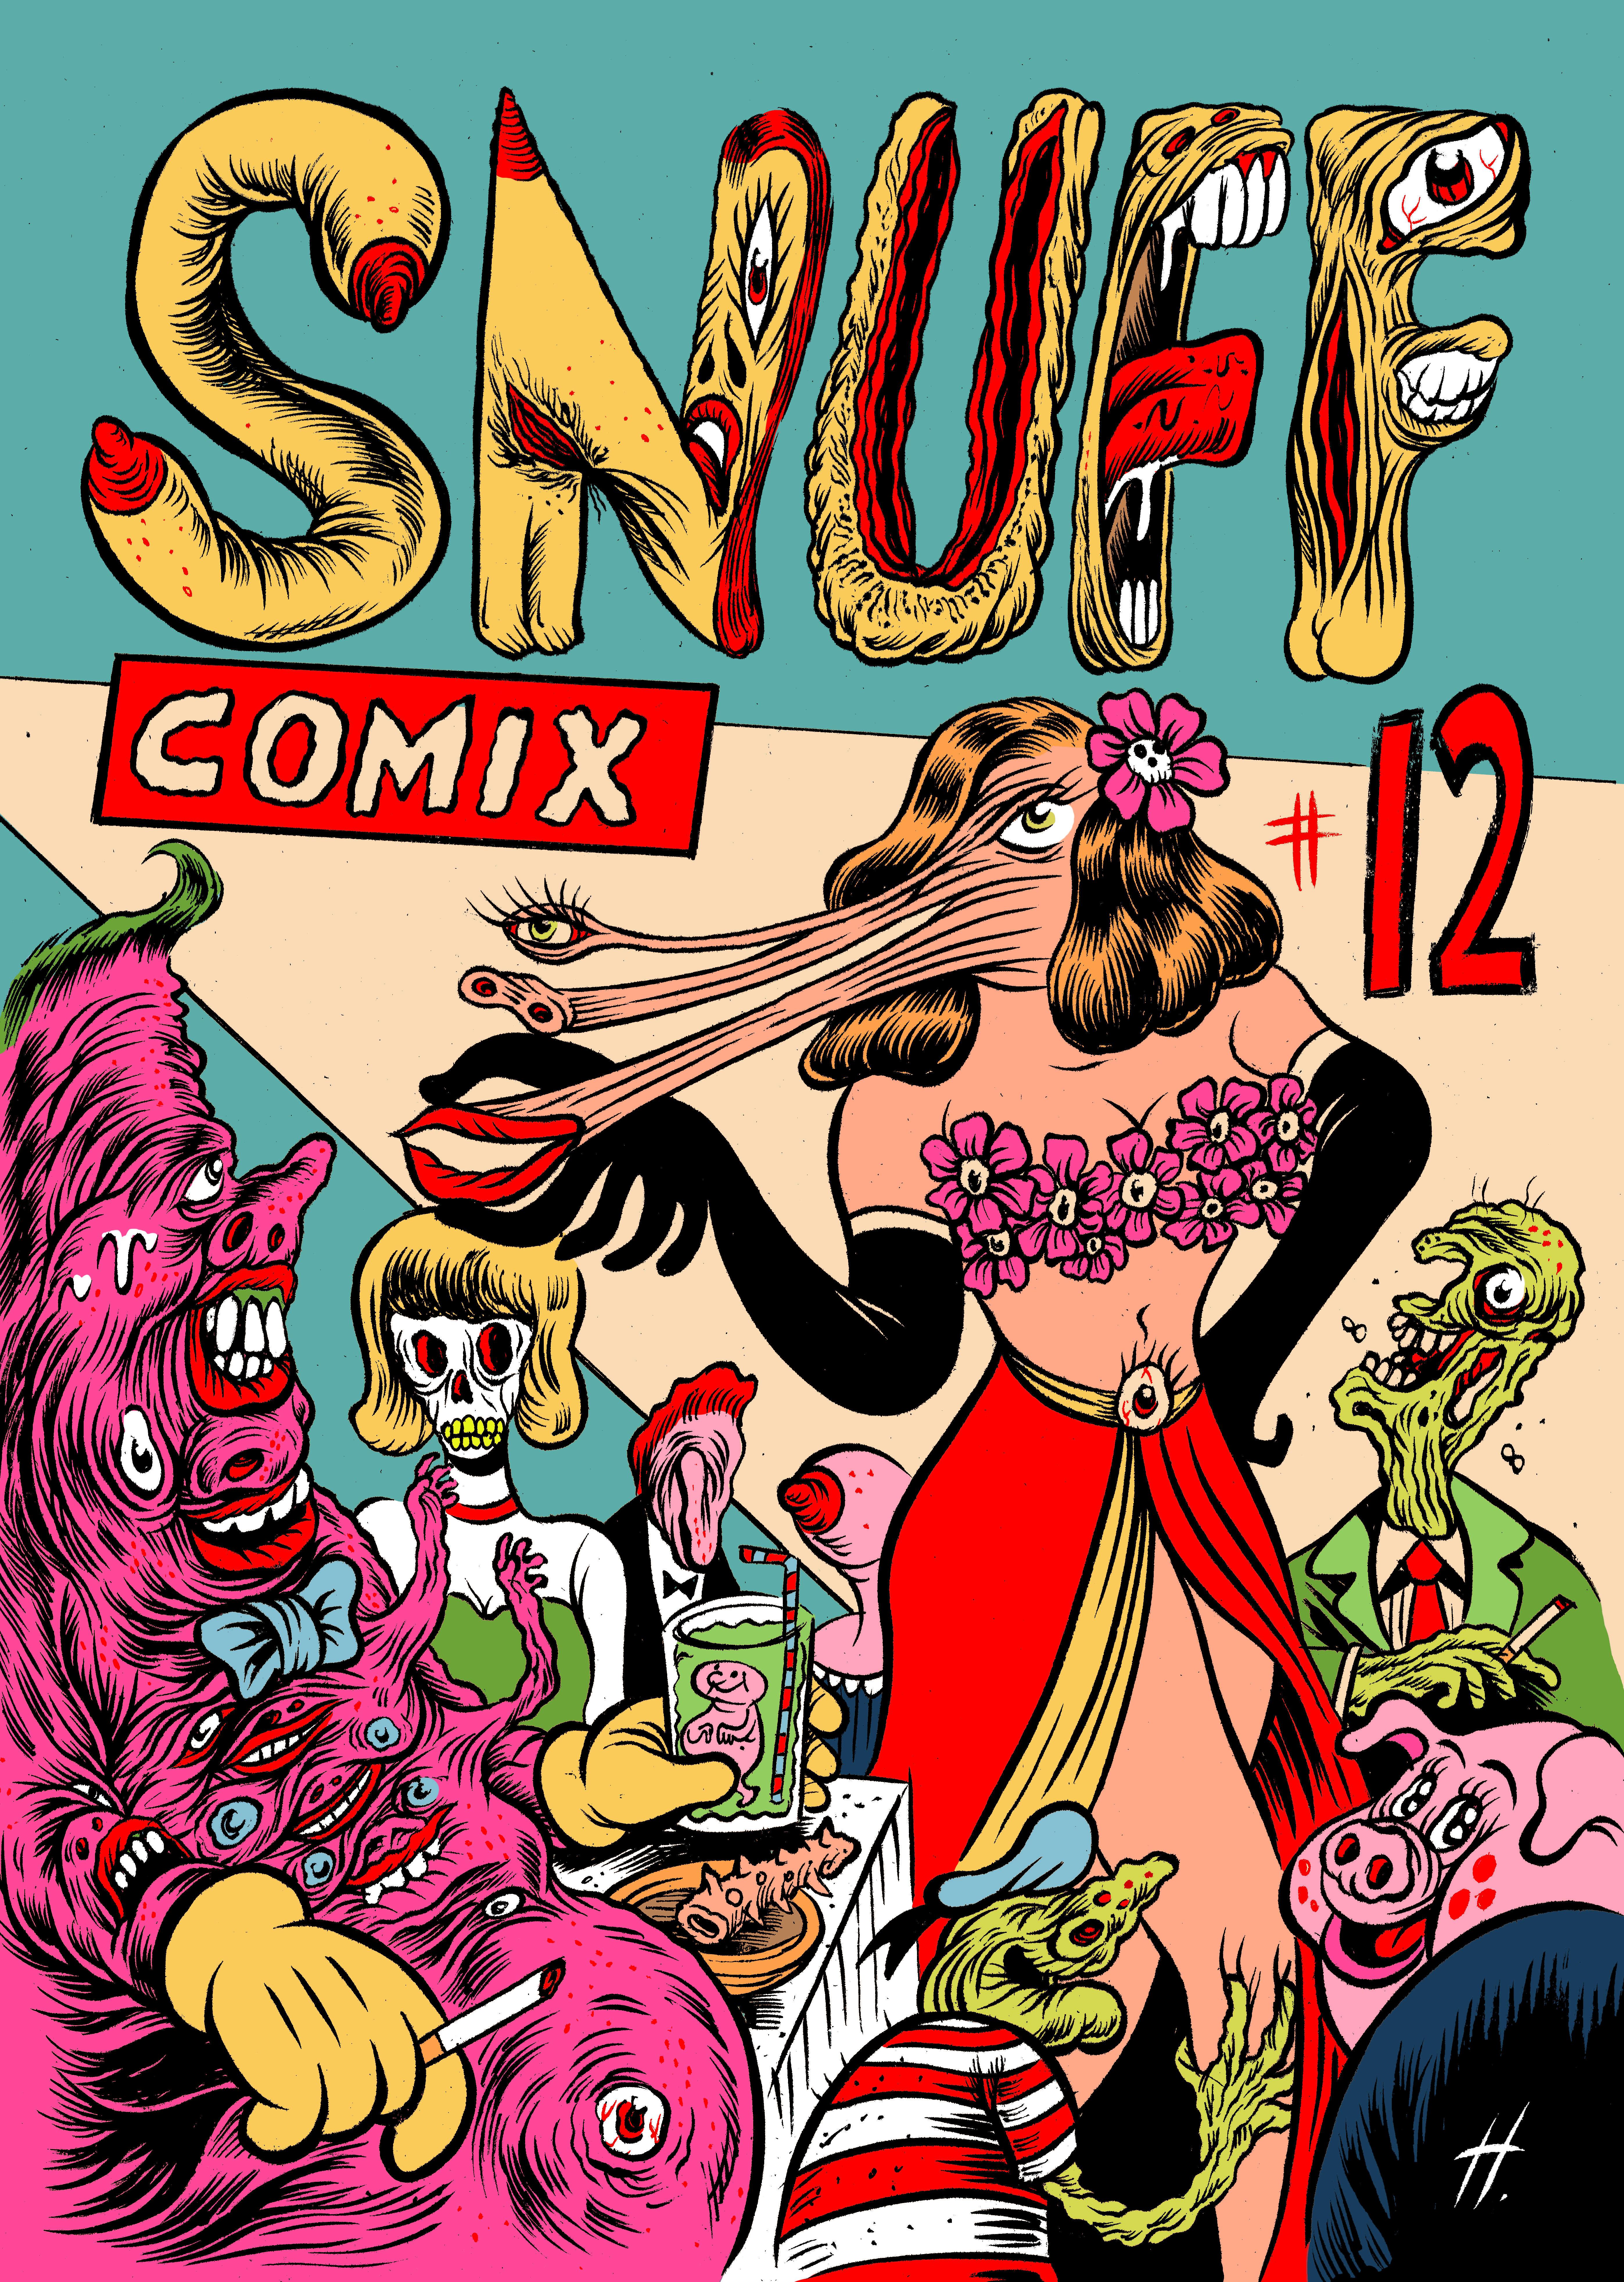 Snuff Comix#912